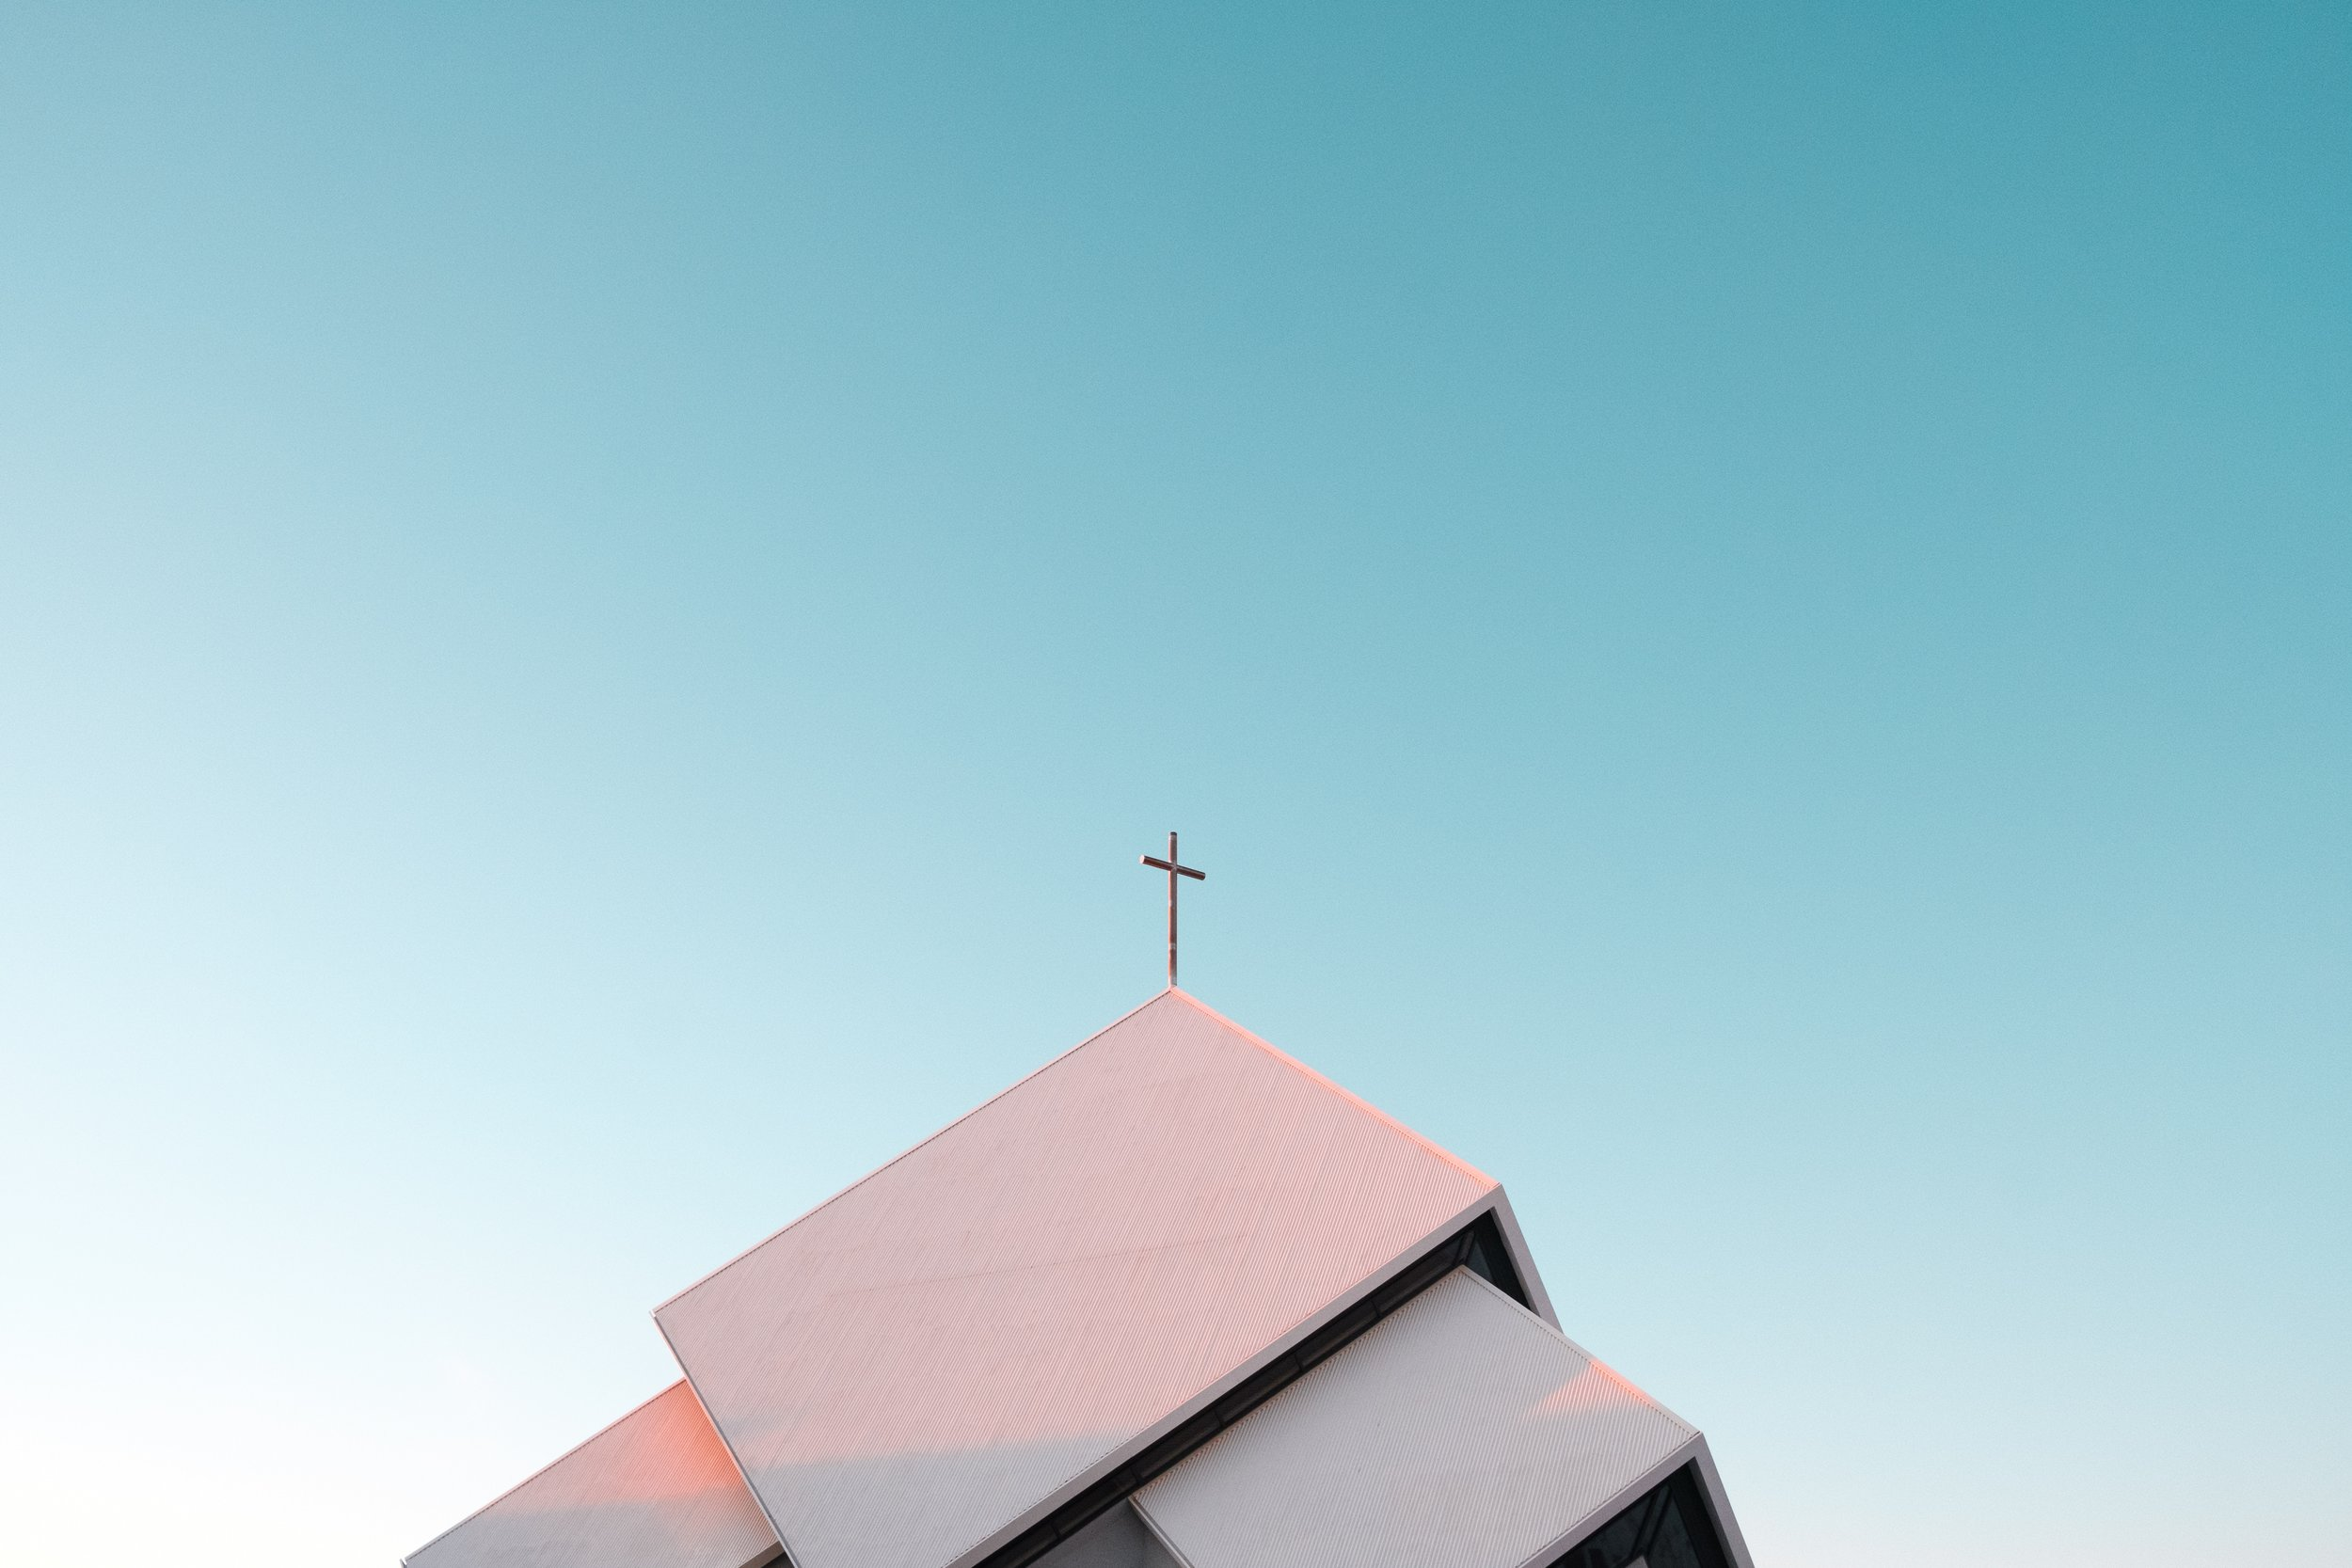 Photo by Akira Hojo on Unsplash